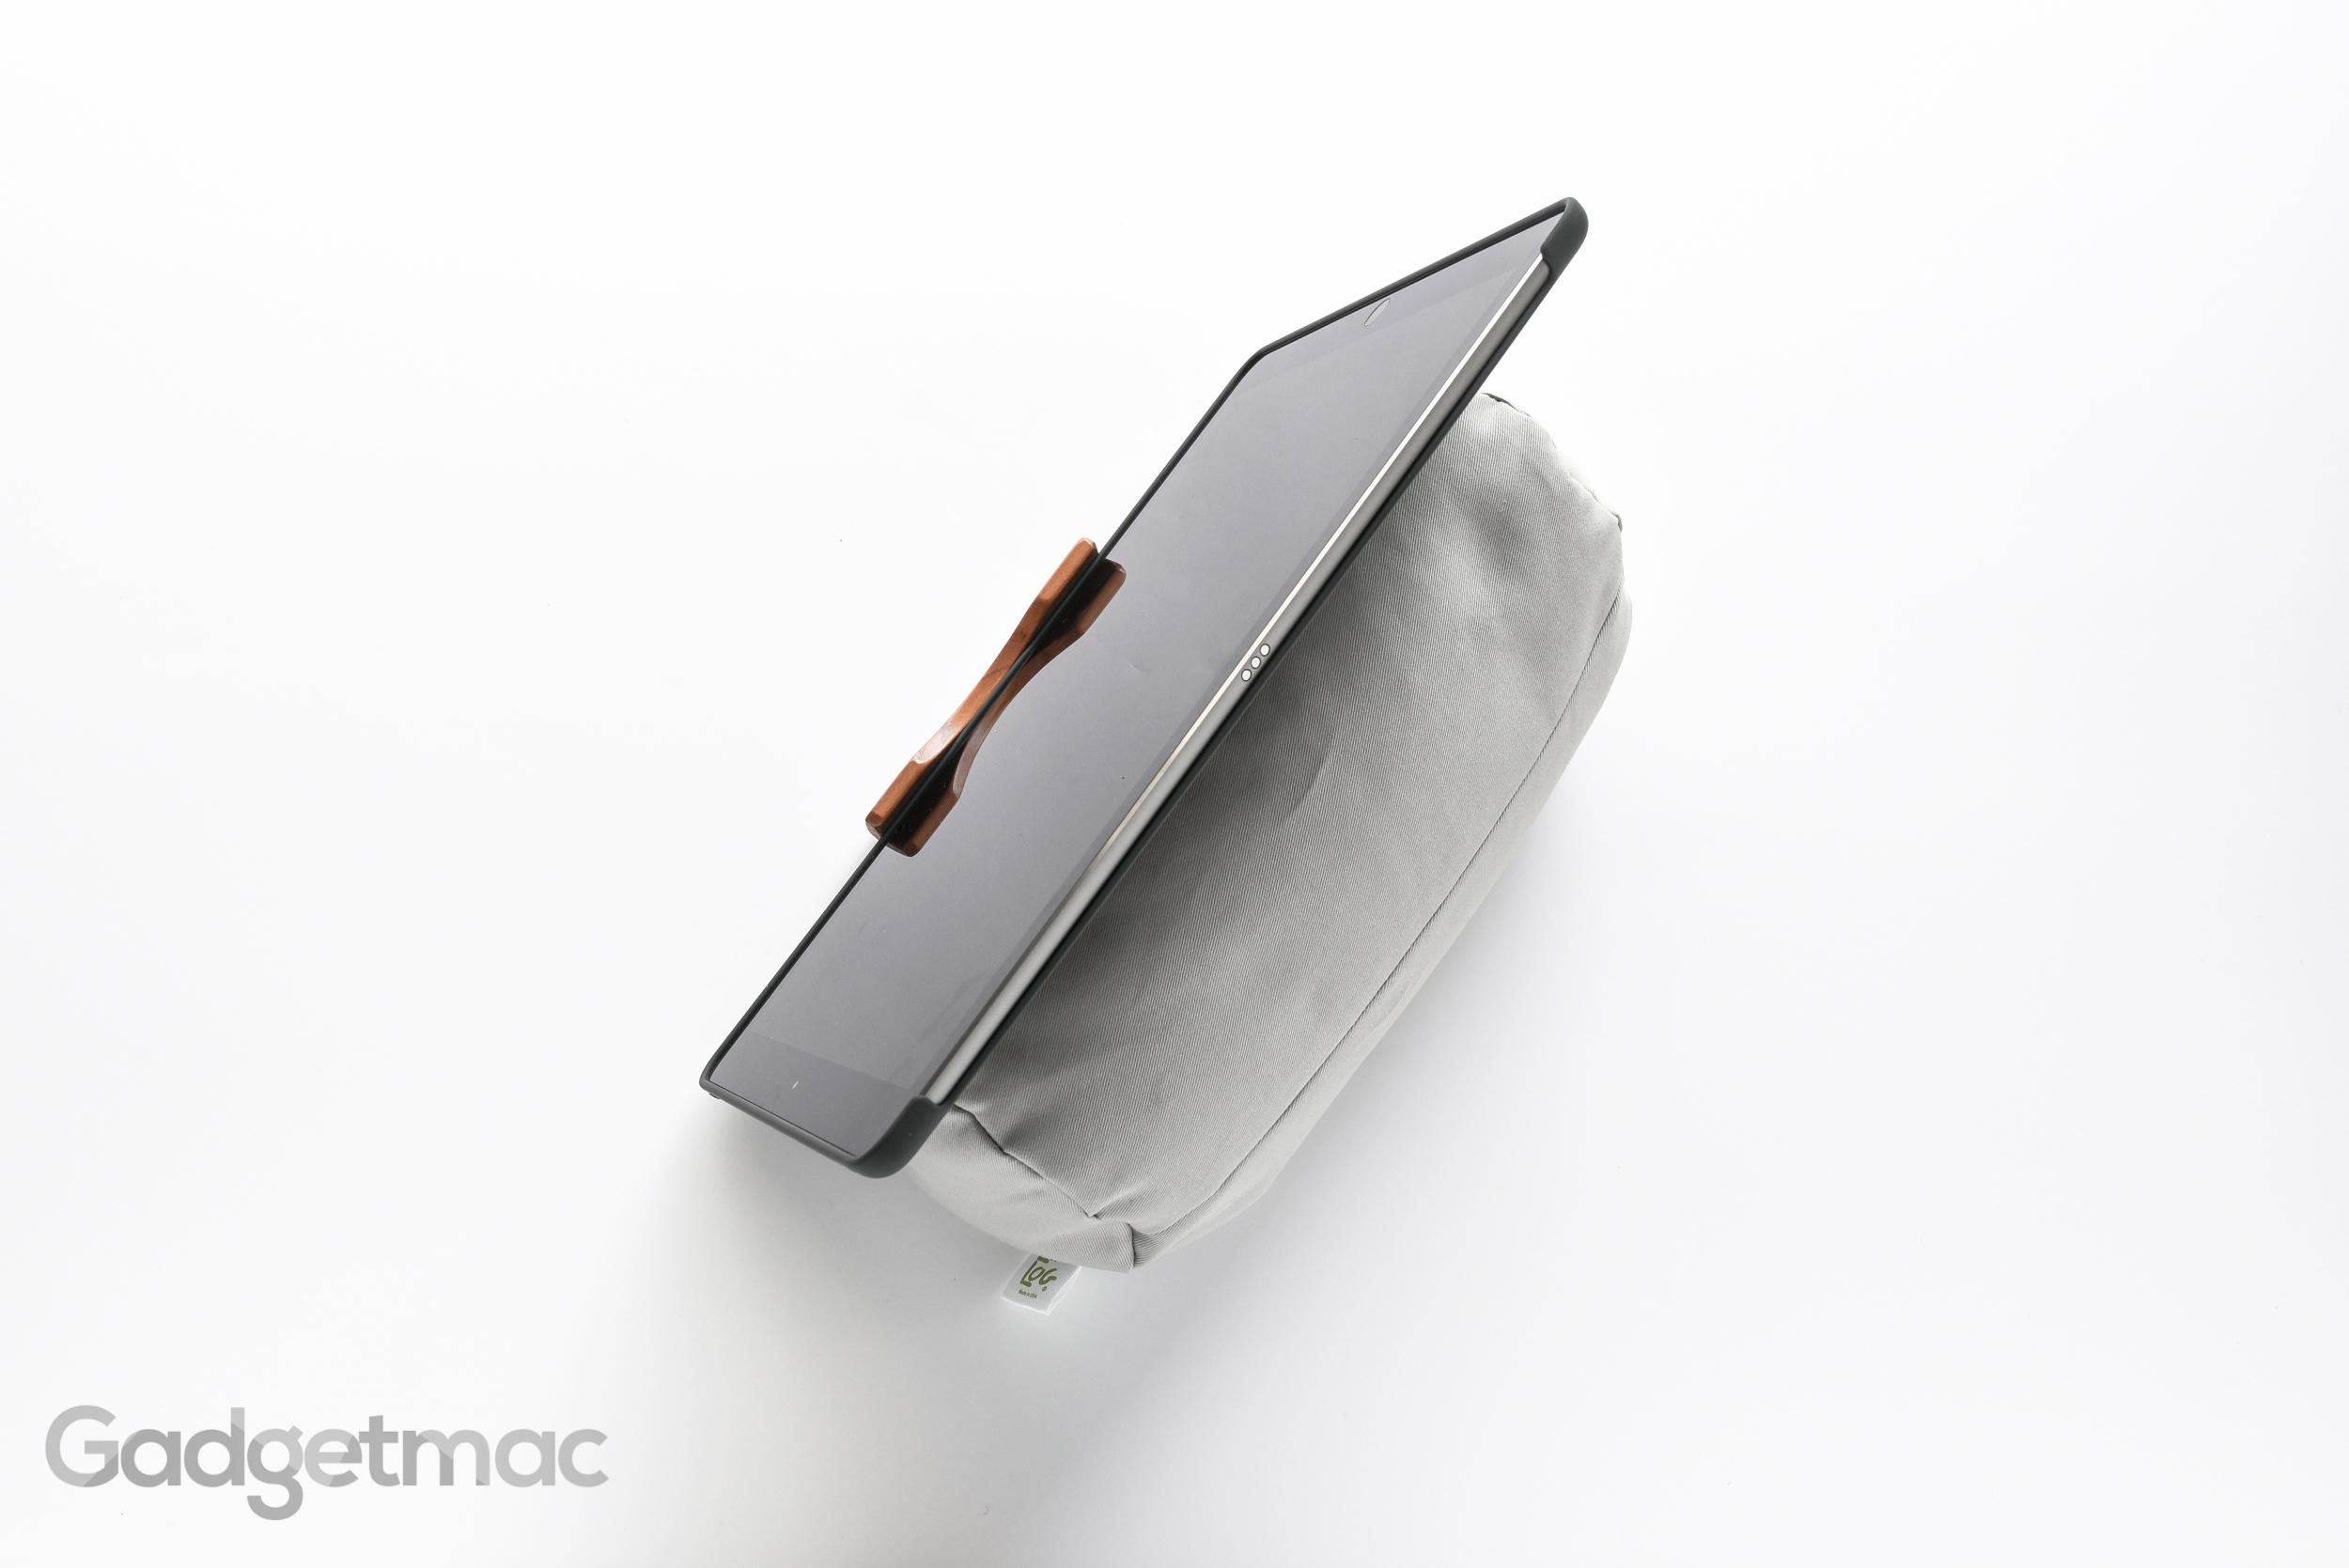 lap-log-classic-ipad-pro-bean-bag-bed-stand.jpg